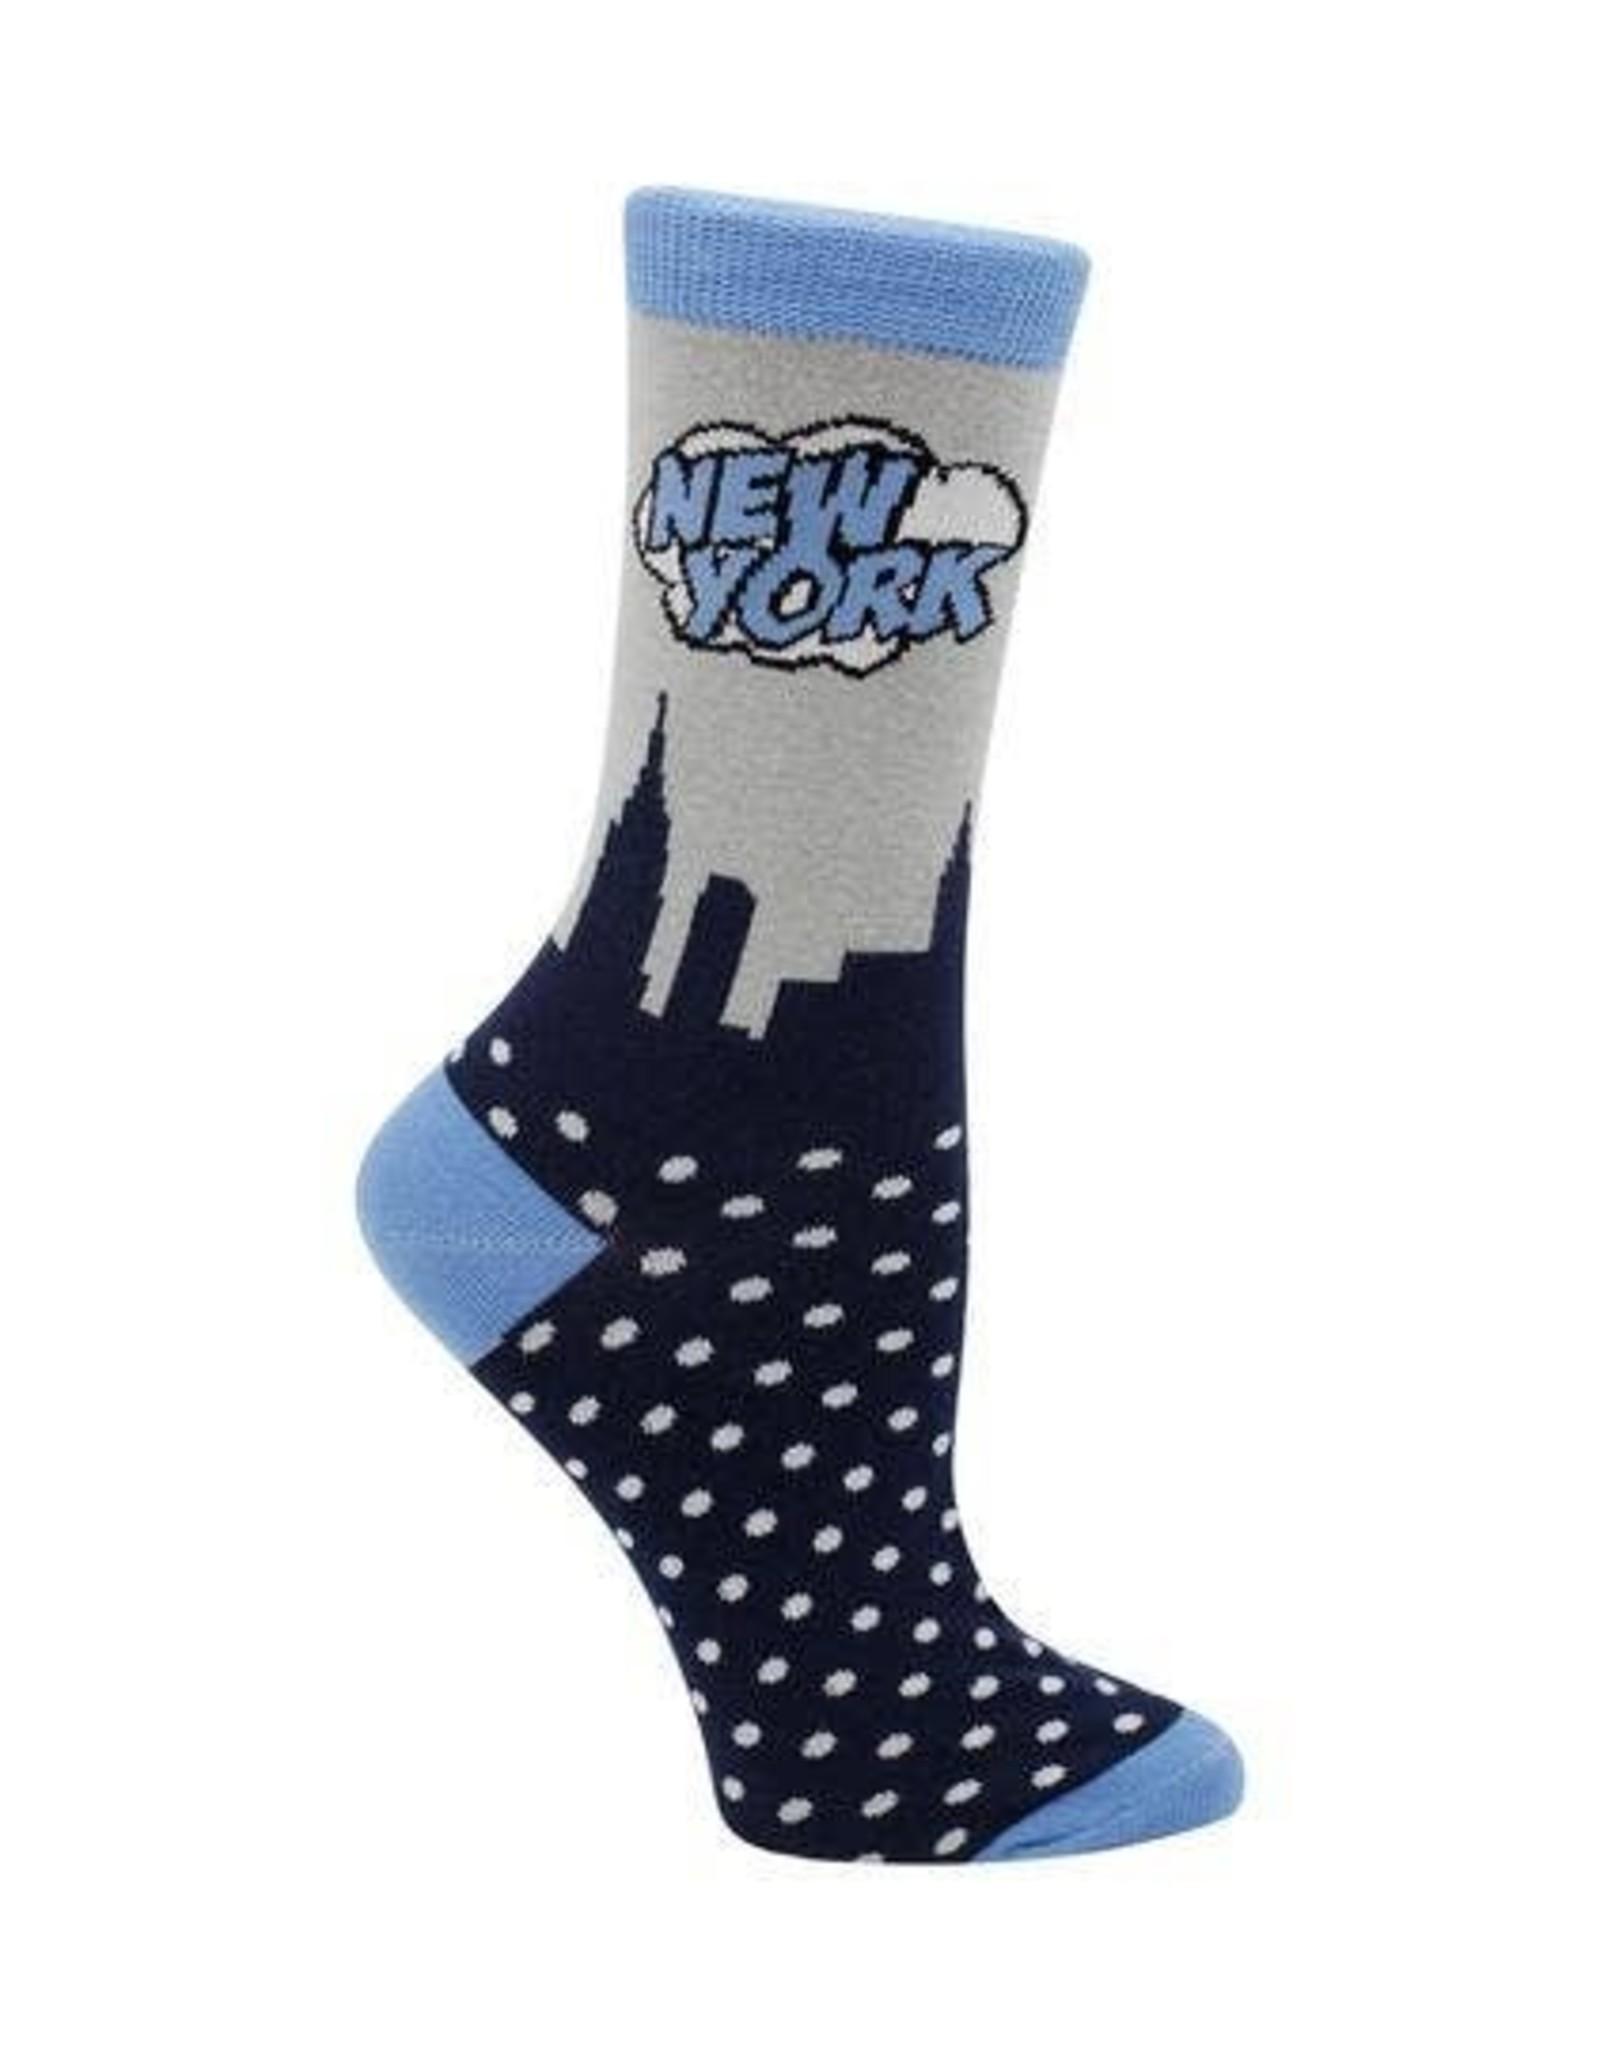 Socks: New York Skyline